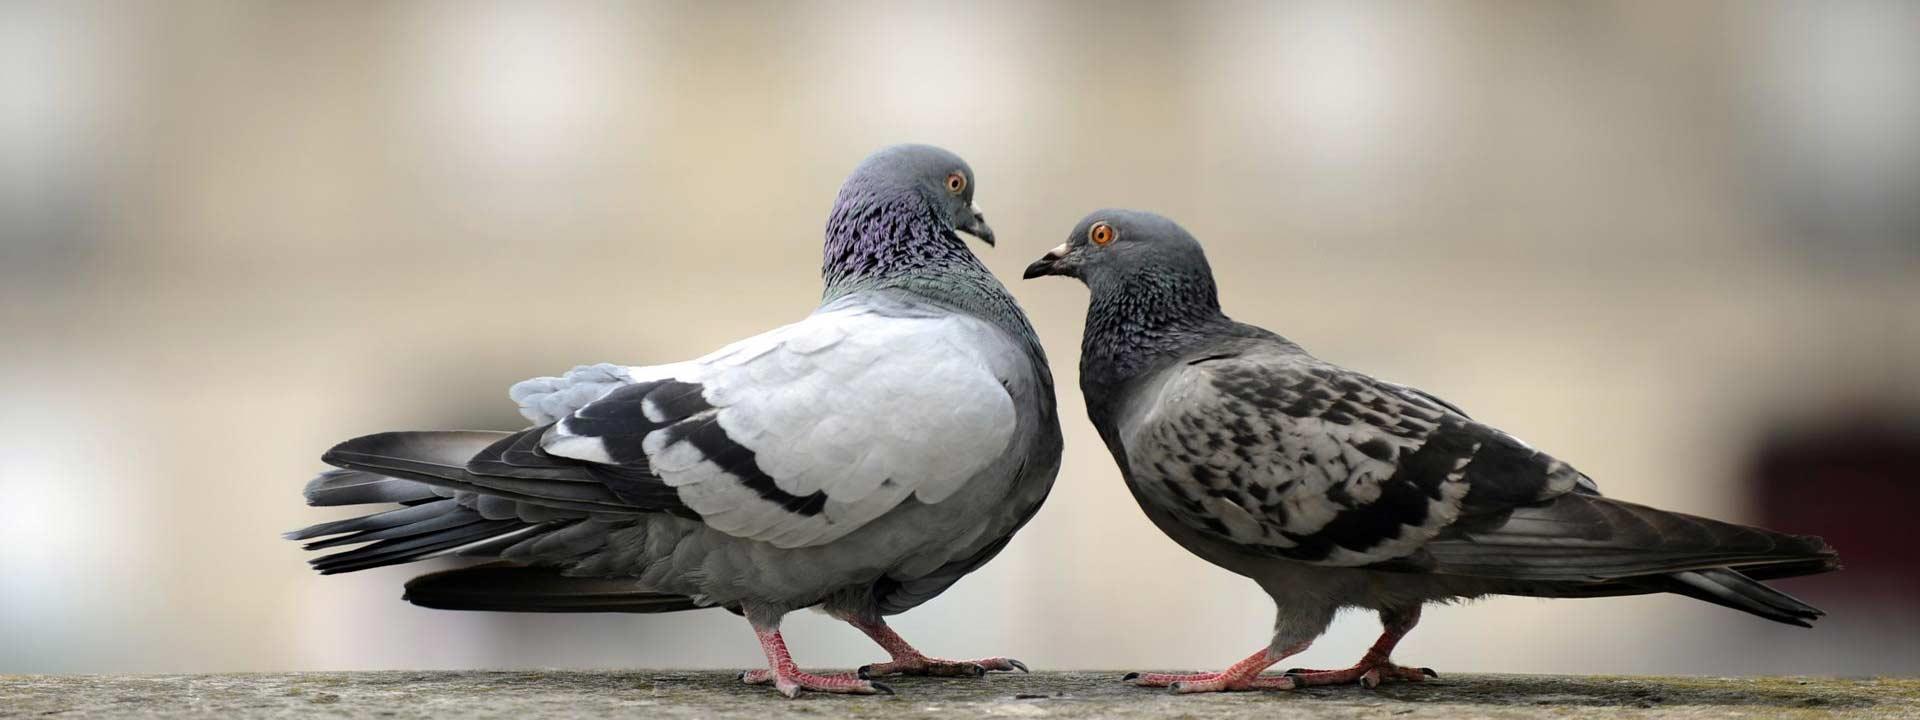 Nettoyage Fiente Pigeons Decapage Pulverisation Produits